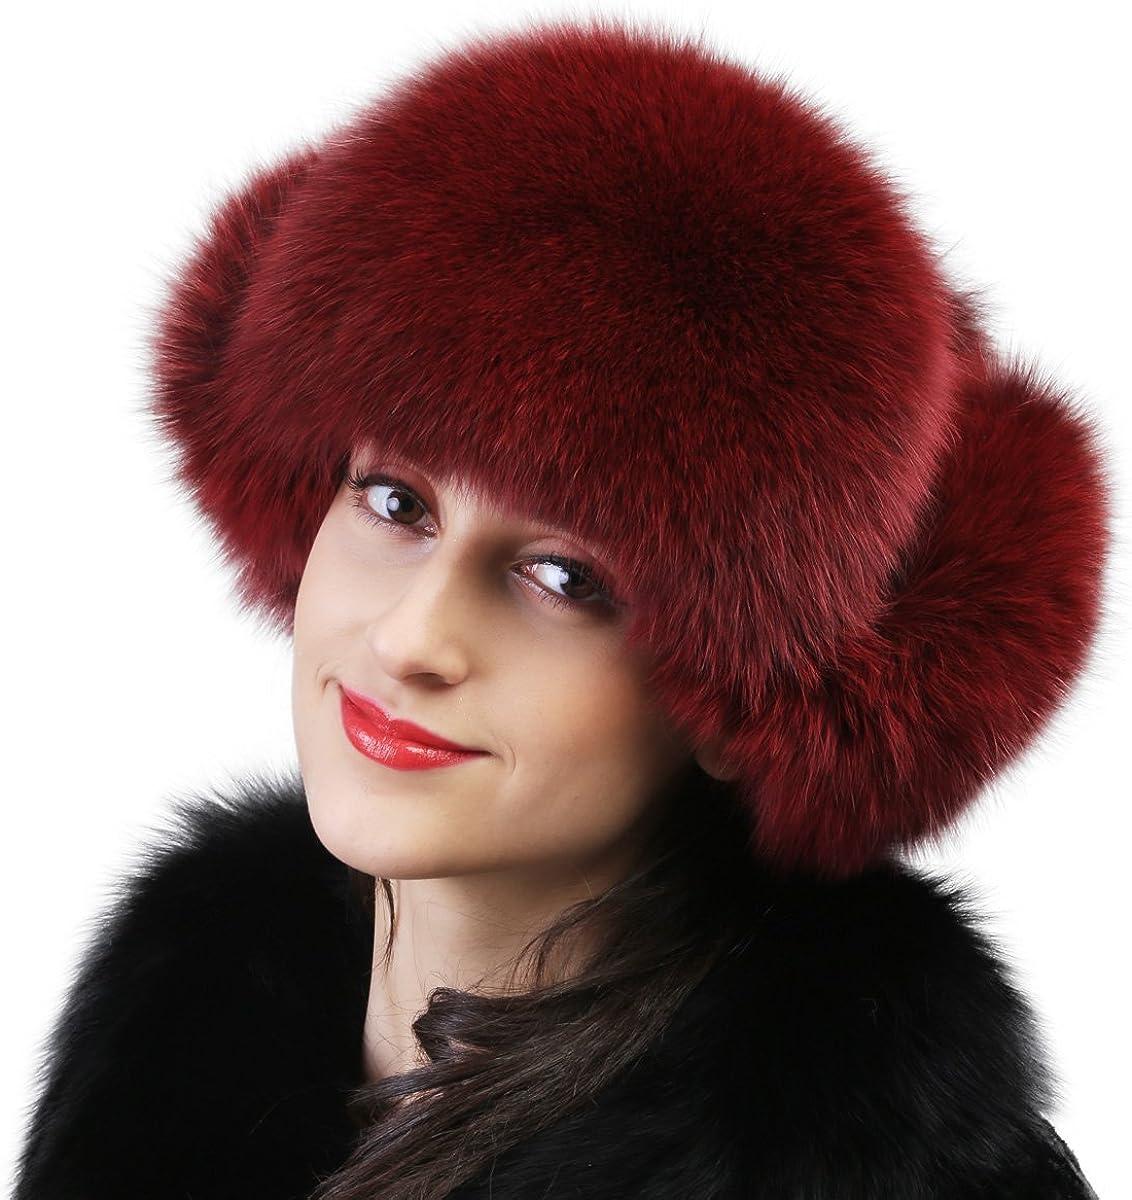 Mandy's Women's Autumn Winter Warm Below Zero Show Ball Real Fur Caps Lady's Fox Fur Hats